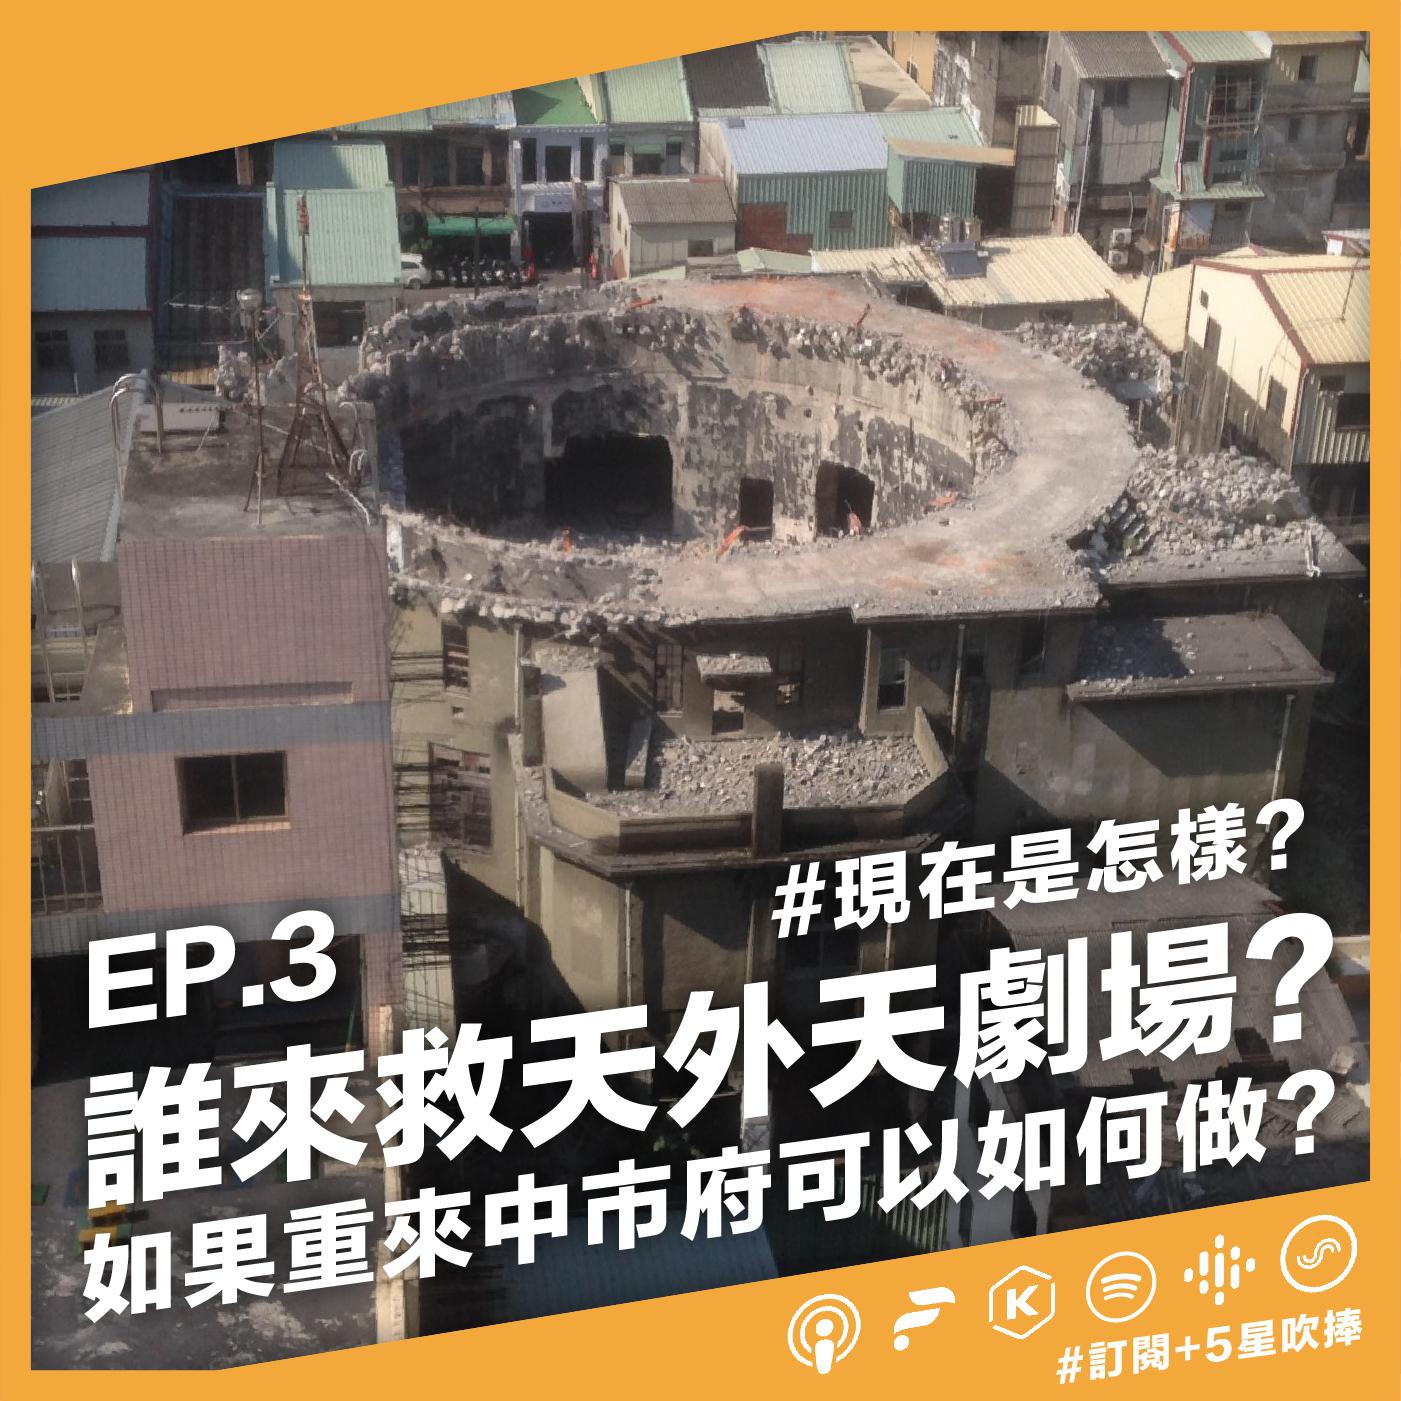 EP03|誰來救天外天劇場?如果重來中市府可以如何做?